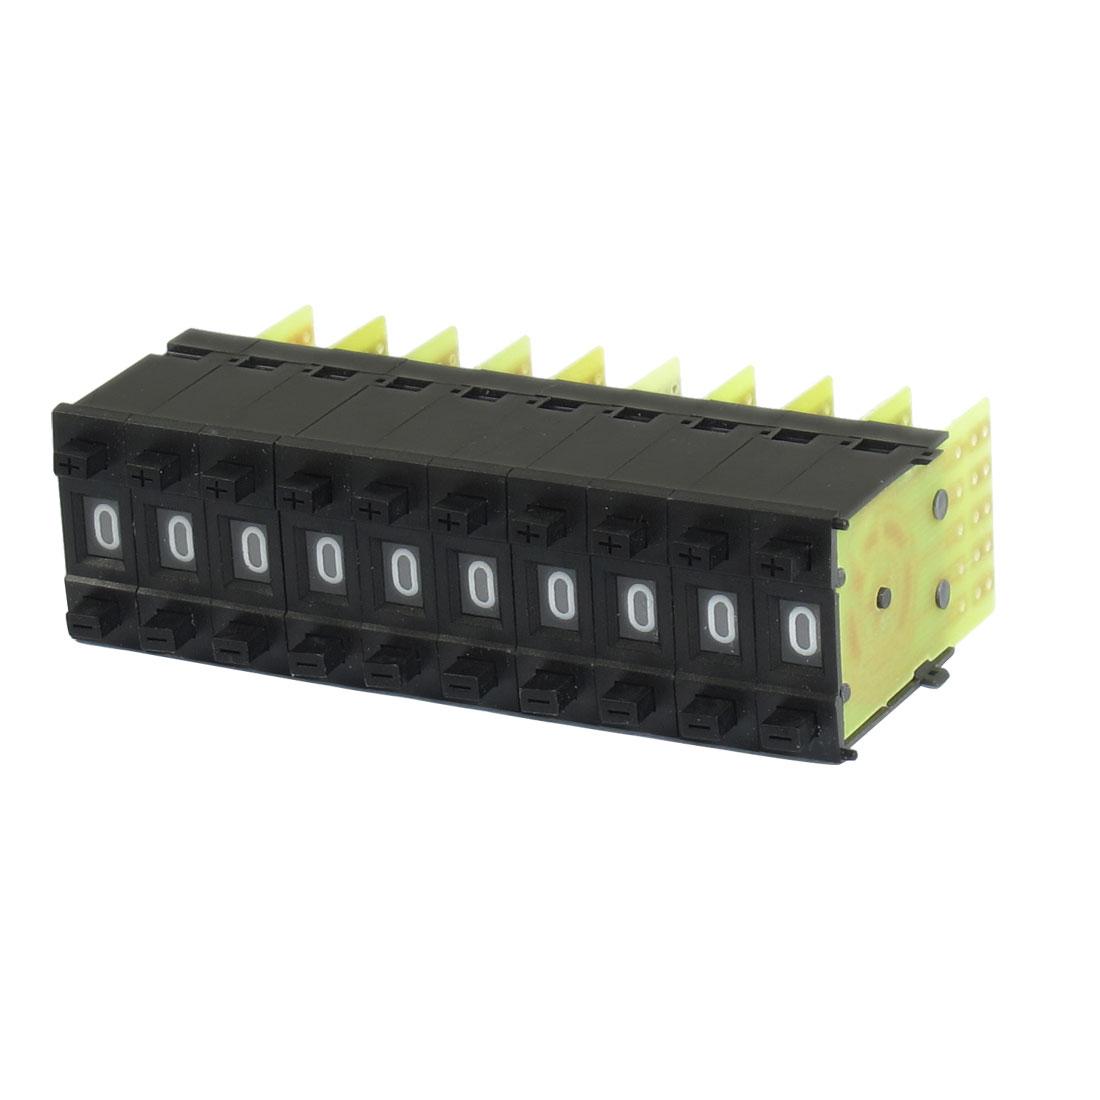 10 Pcs KM1 0-9 Digital BCD Code Thumbwheel Pushwheel Switches Black 22mm x 8mm